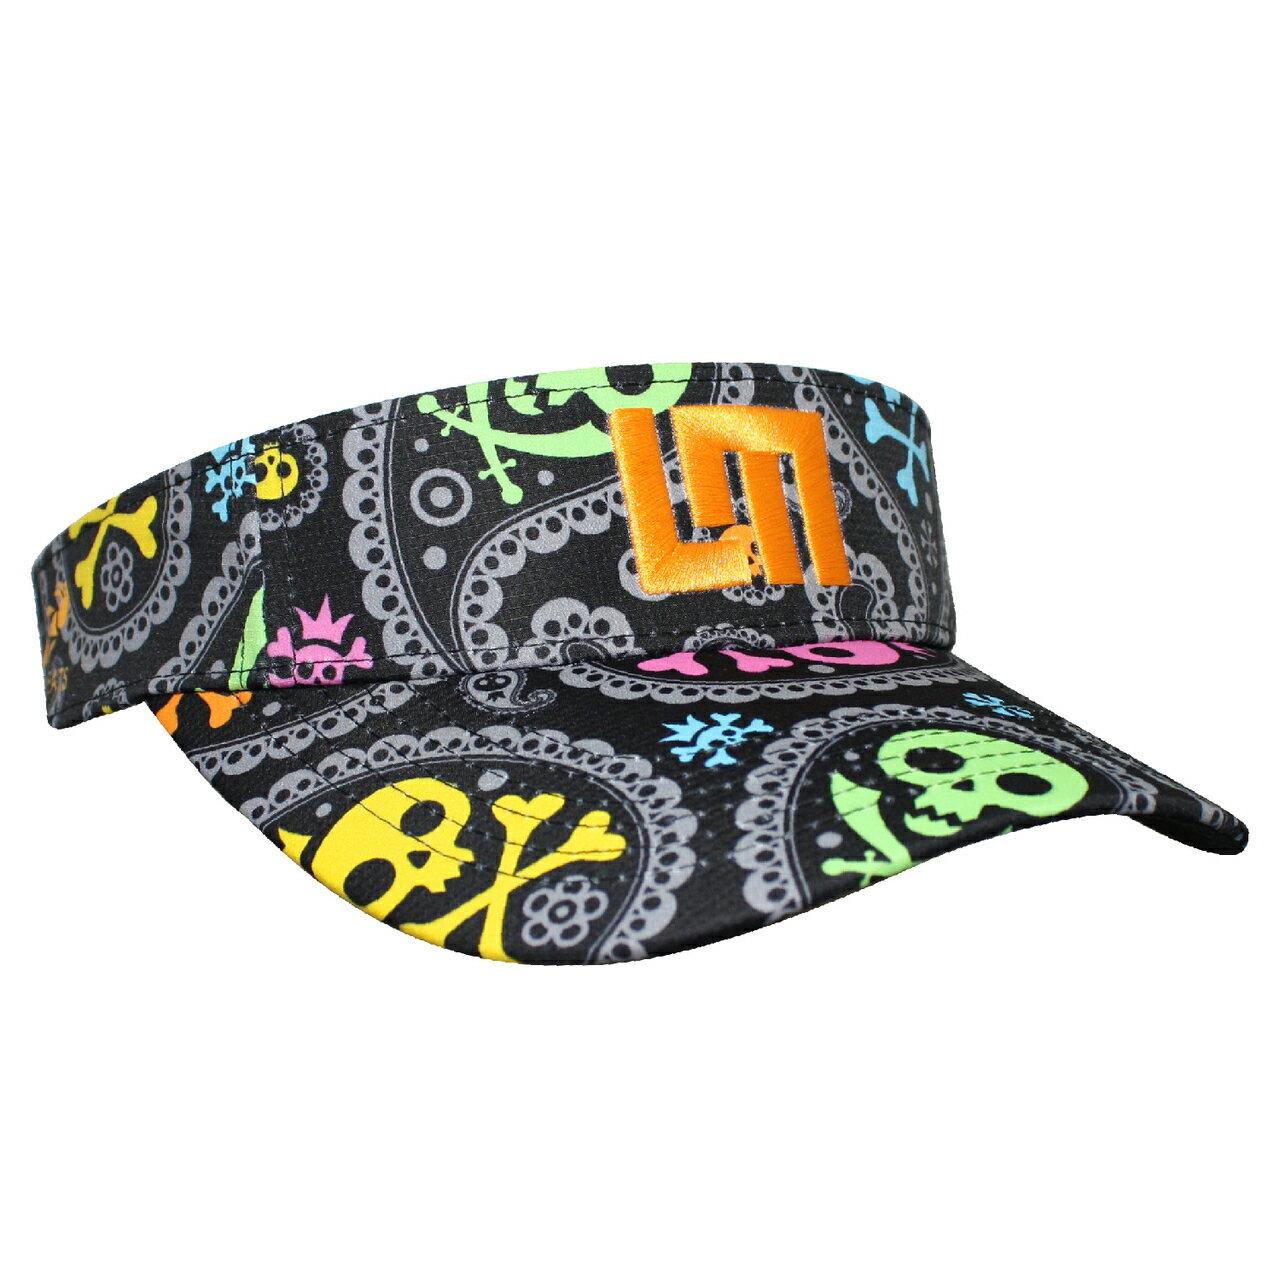 LOUDMOUTH 英國高爾夫服飾品牌-海盜船中空帽